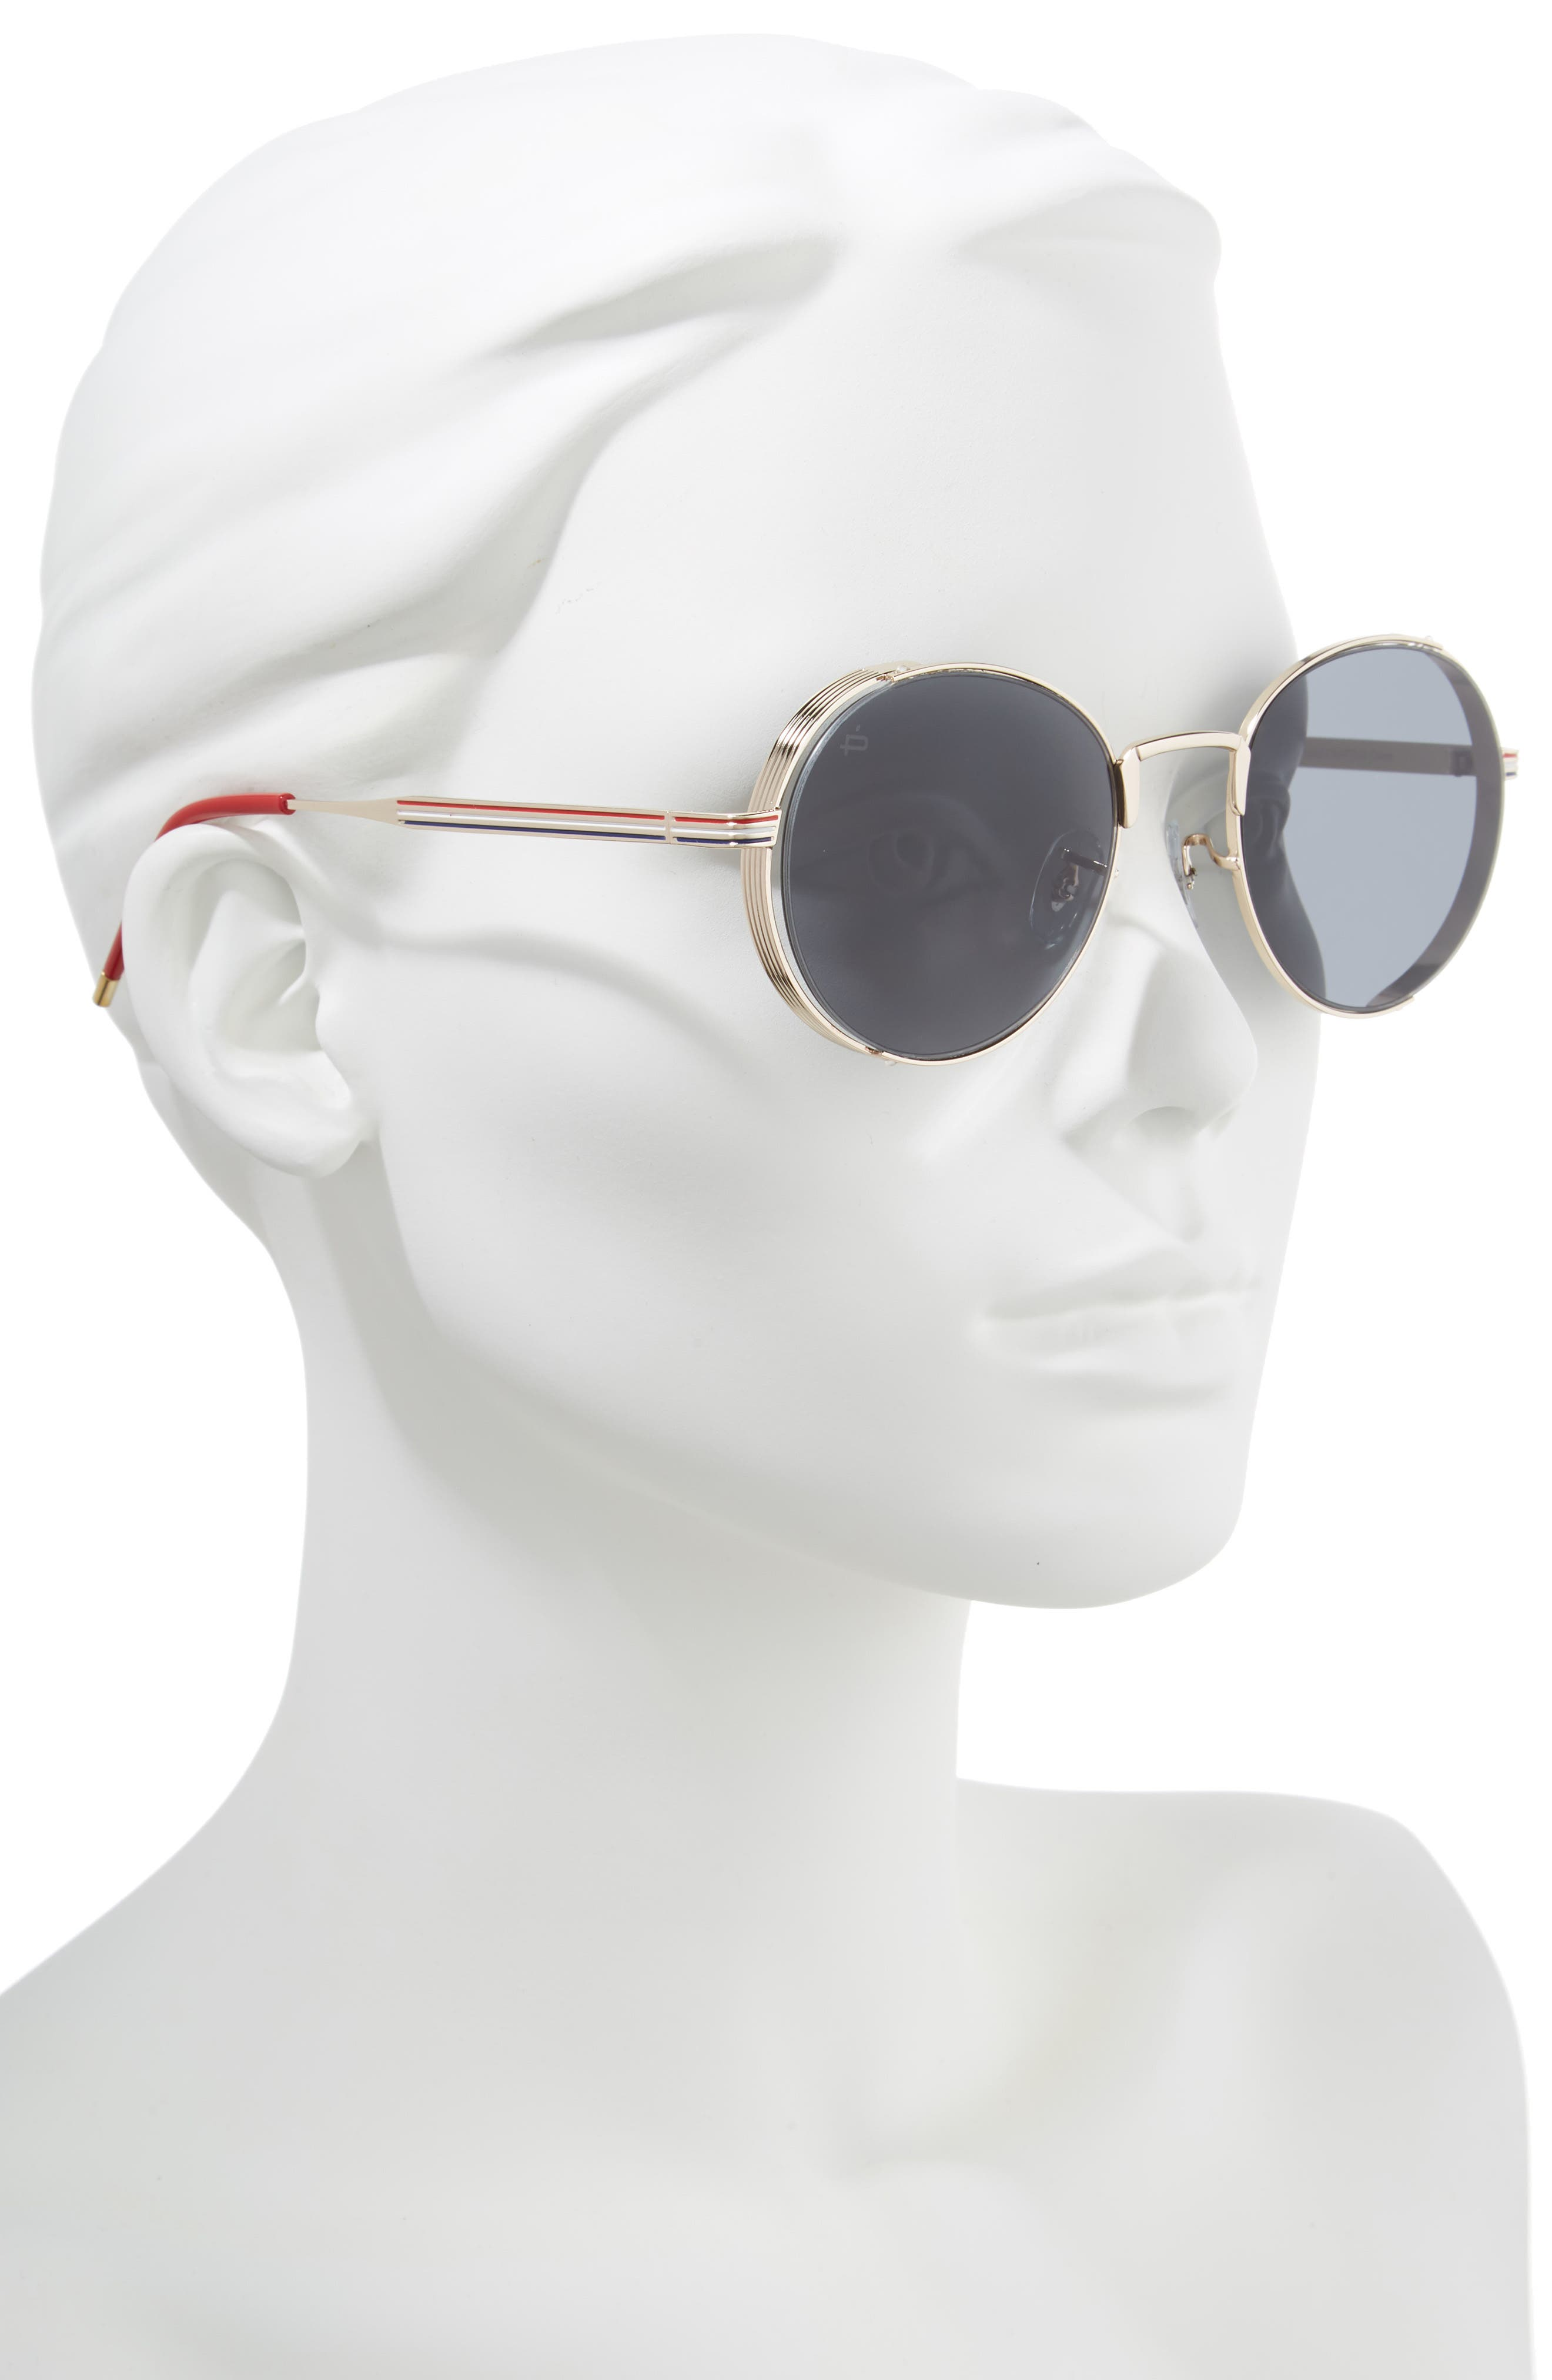 Privé Revaux The Riviera Round Sunglasses,                             Alternate thumbnail 2, color,                             020